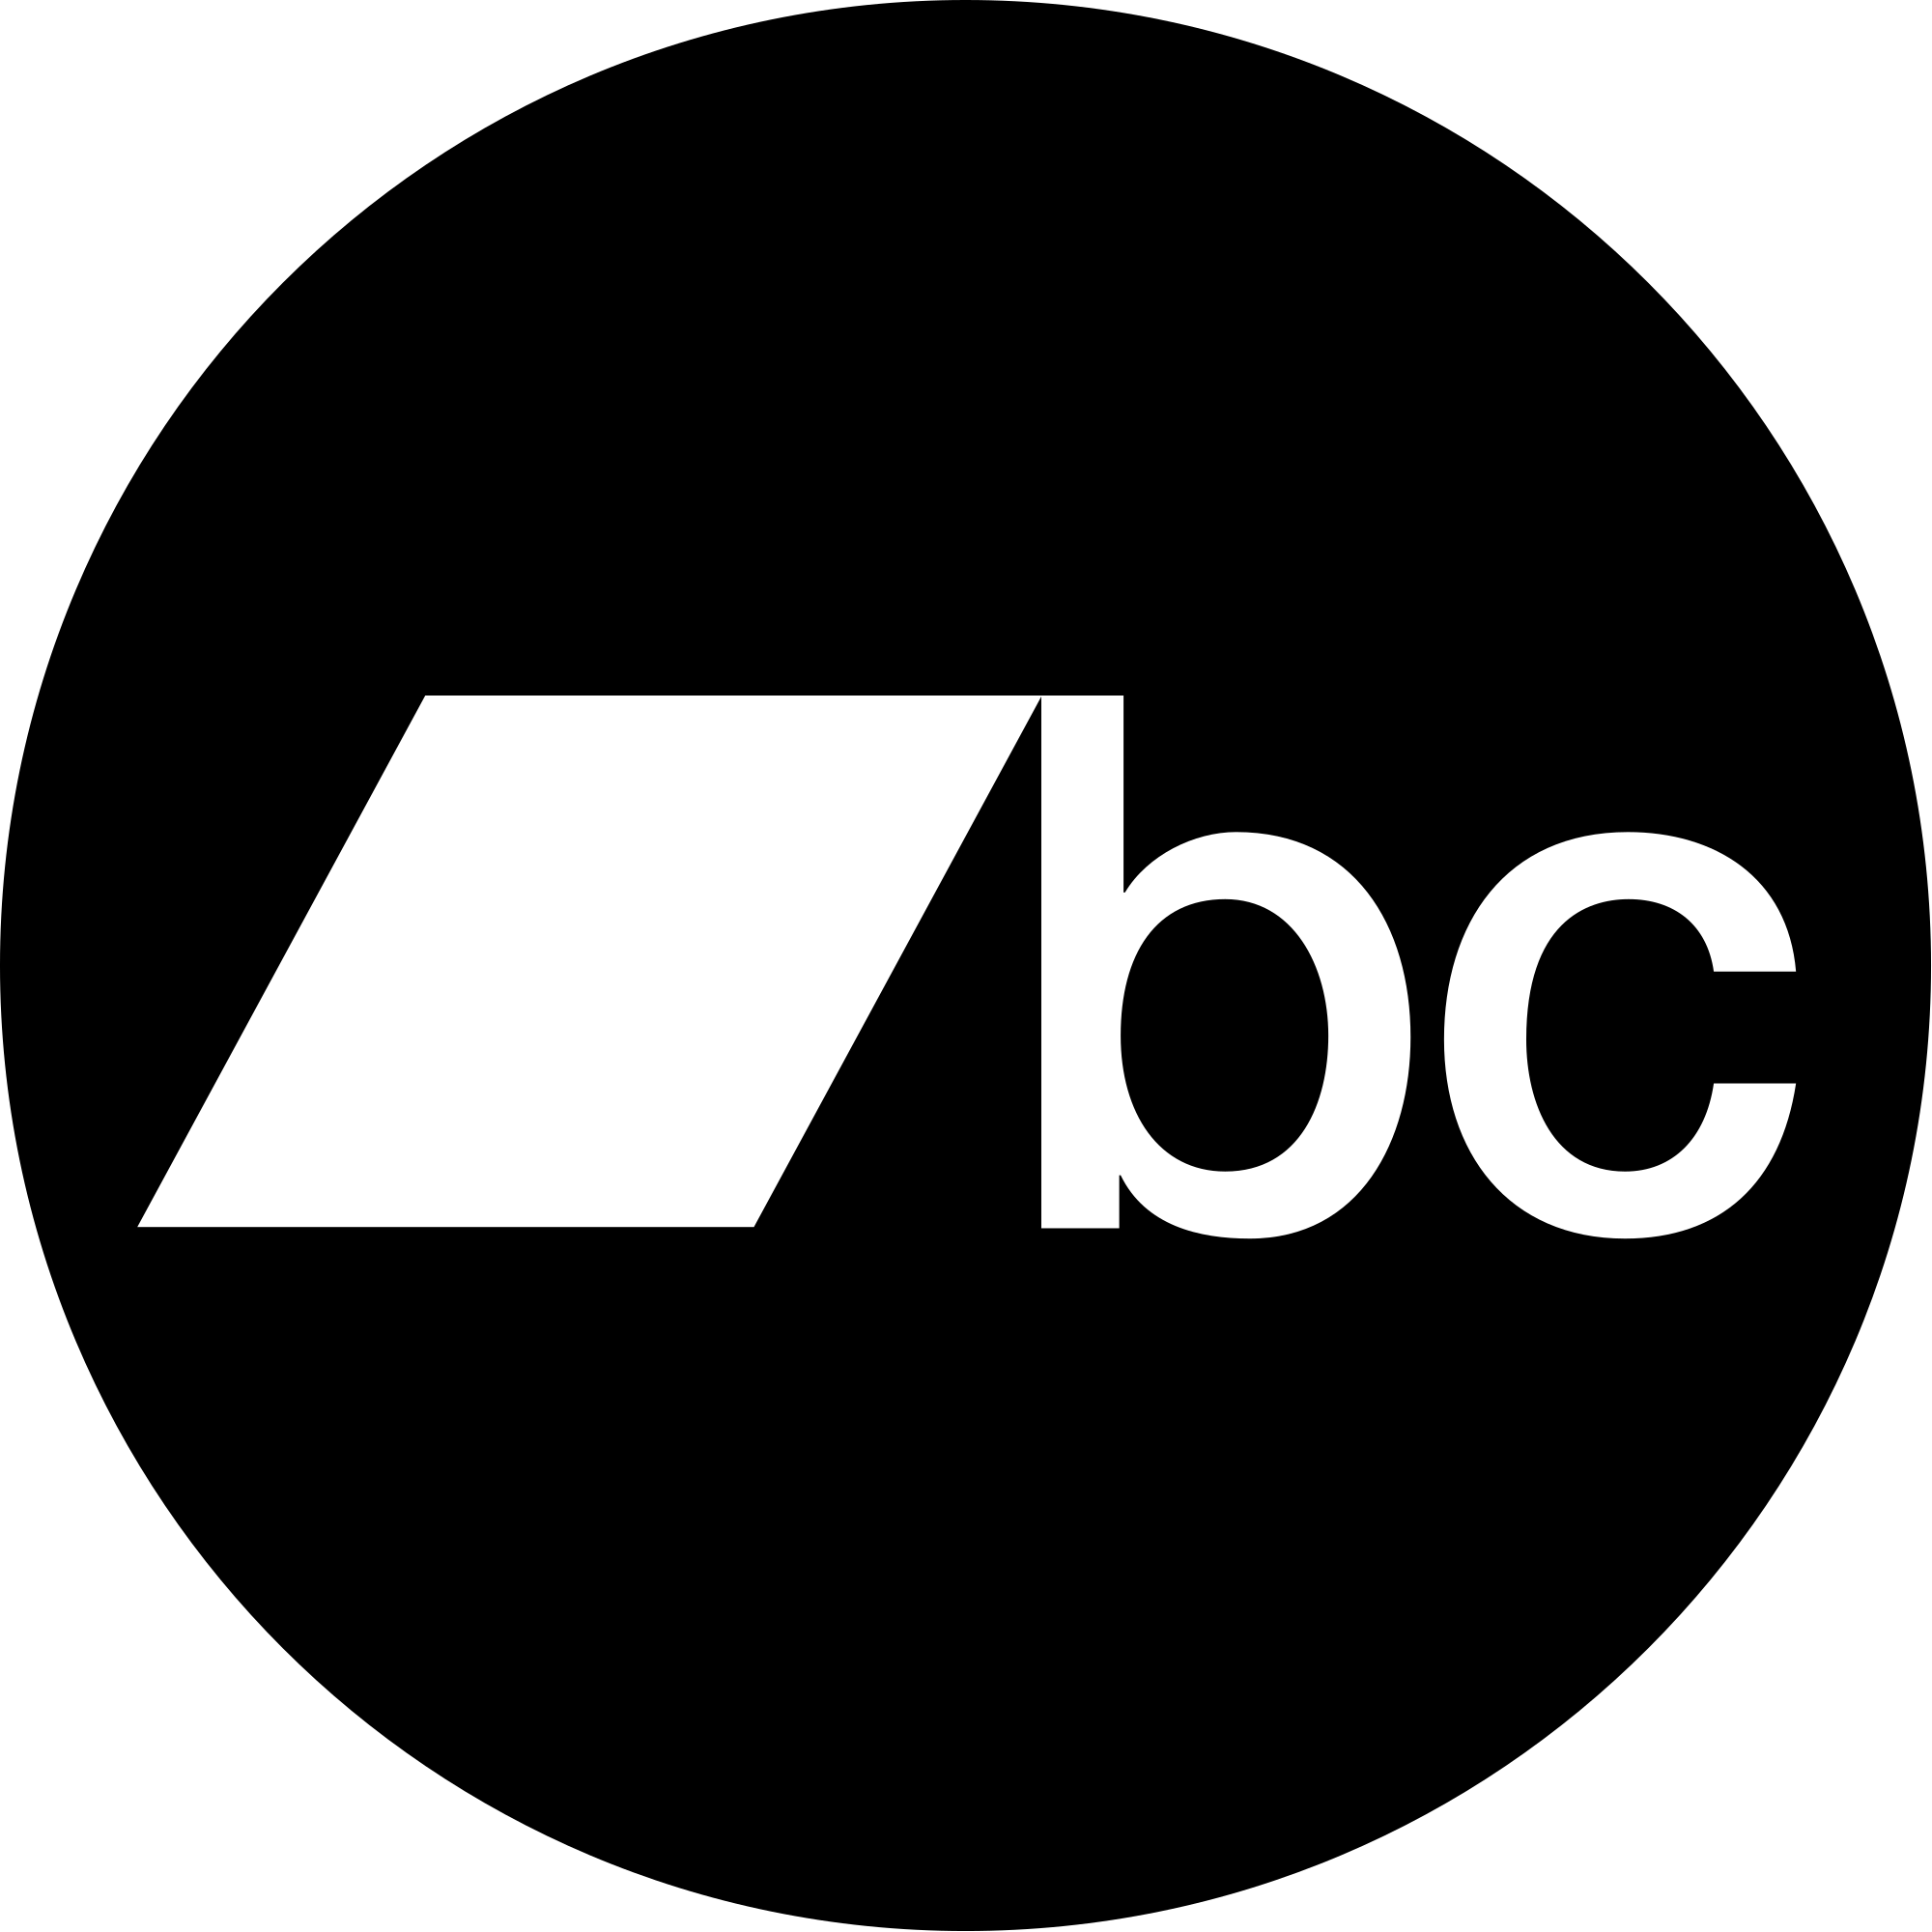 bandcamp logo black background - HD2000×2000